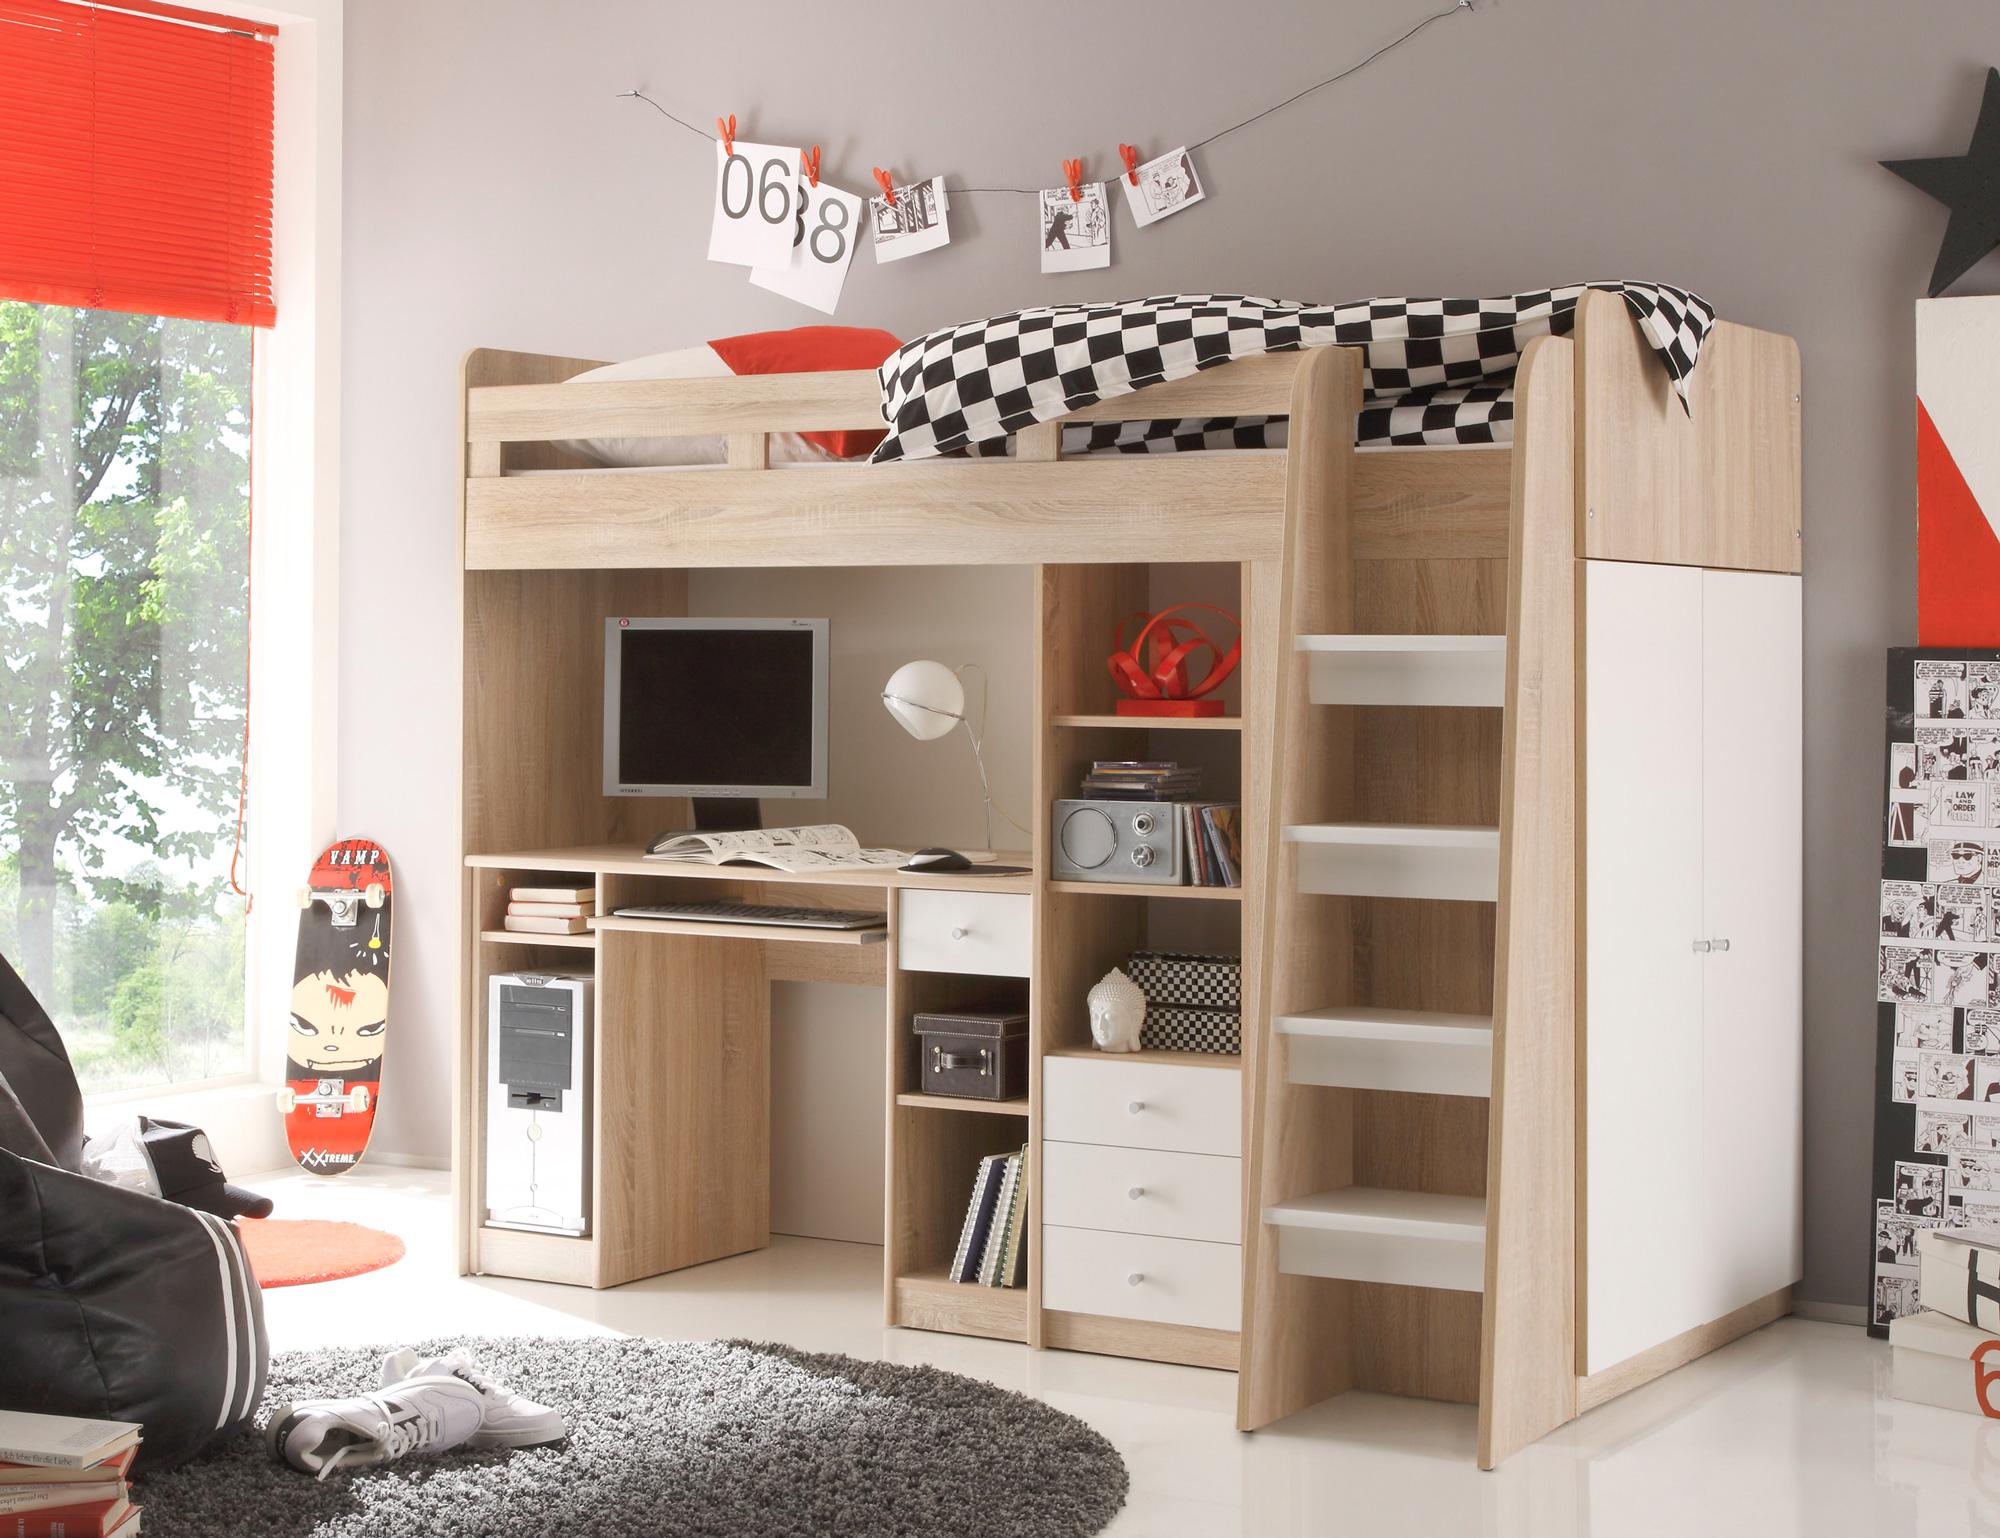 unity 3in1 hochbett 90x200 cm eiche sonoma wei. Black Bedroom Furniture Sets. Home Design Ideas